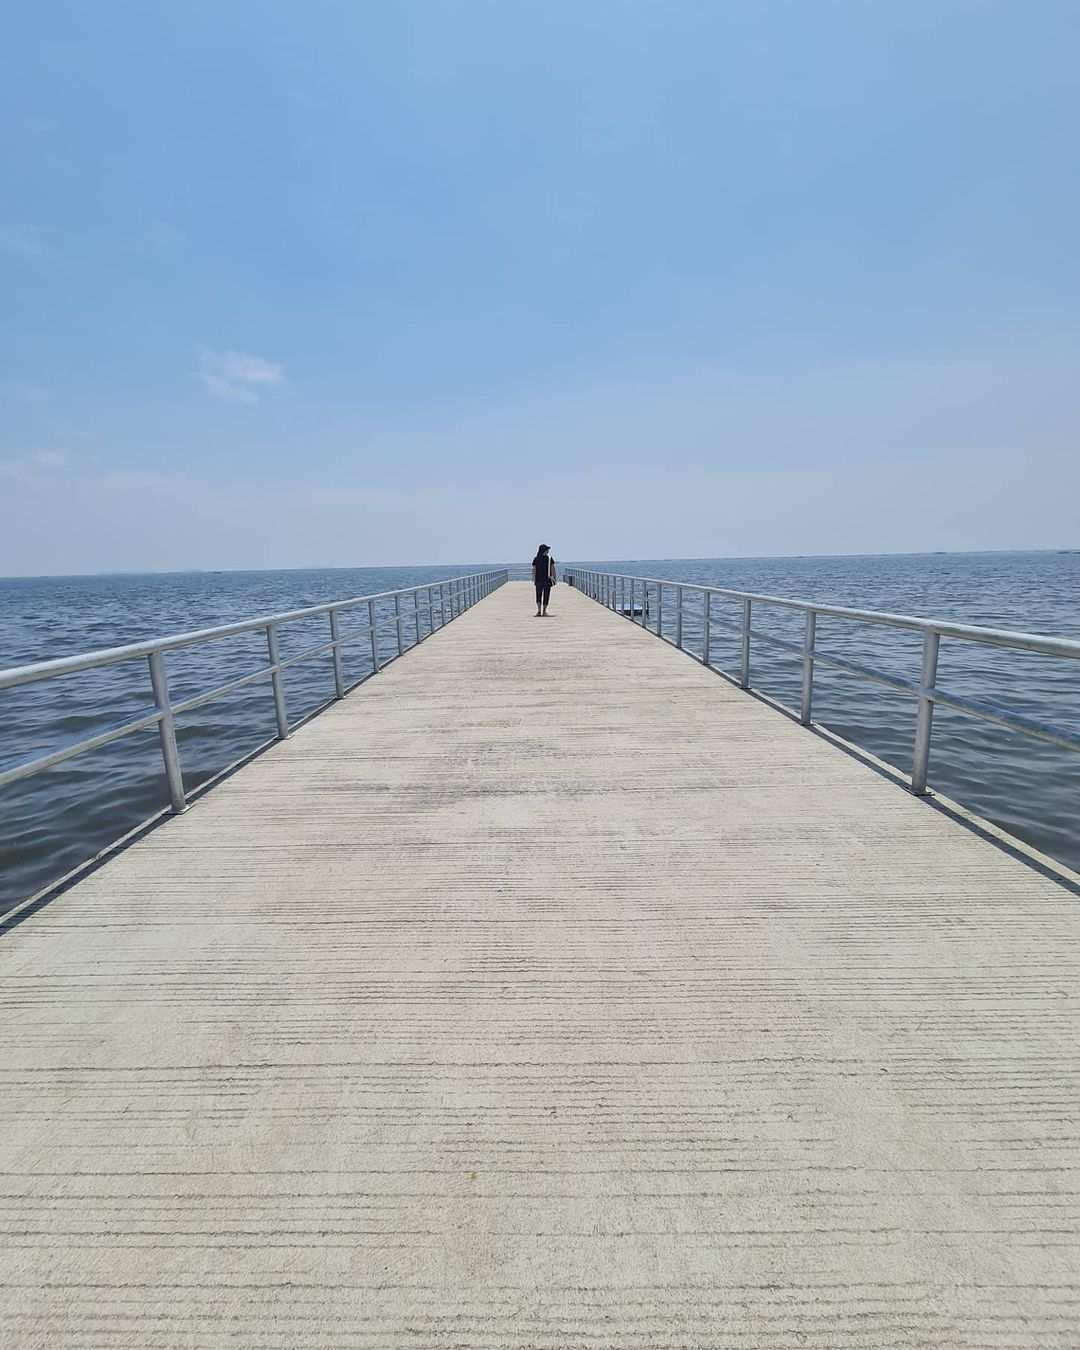 Jembatan di Pantai Pasir Putih PIK 2 Image From @helenkurniawati